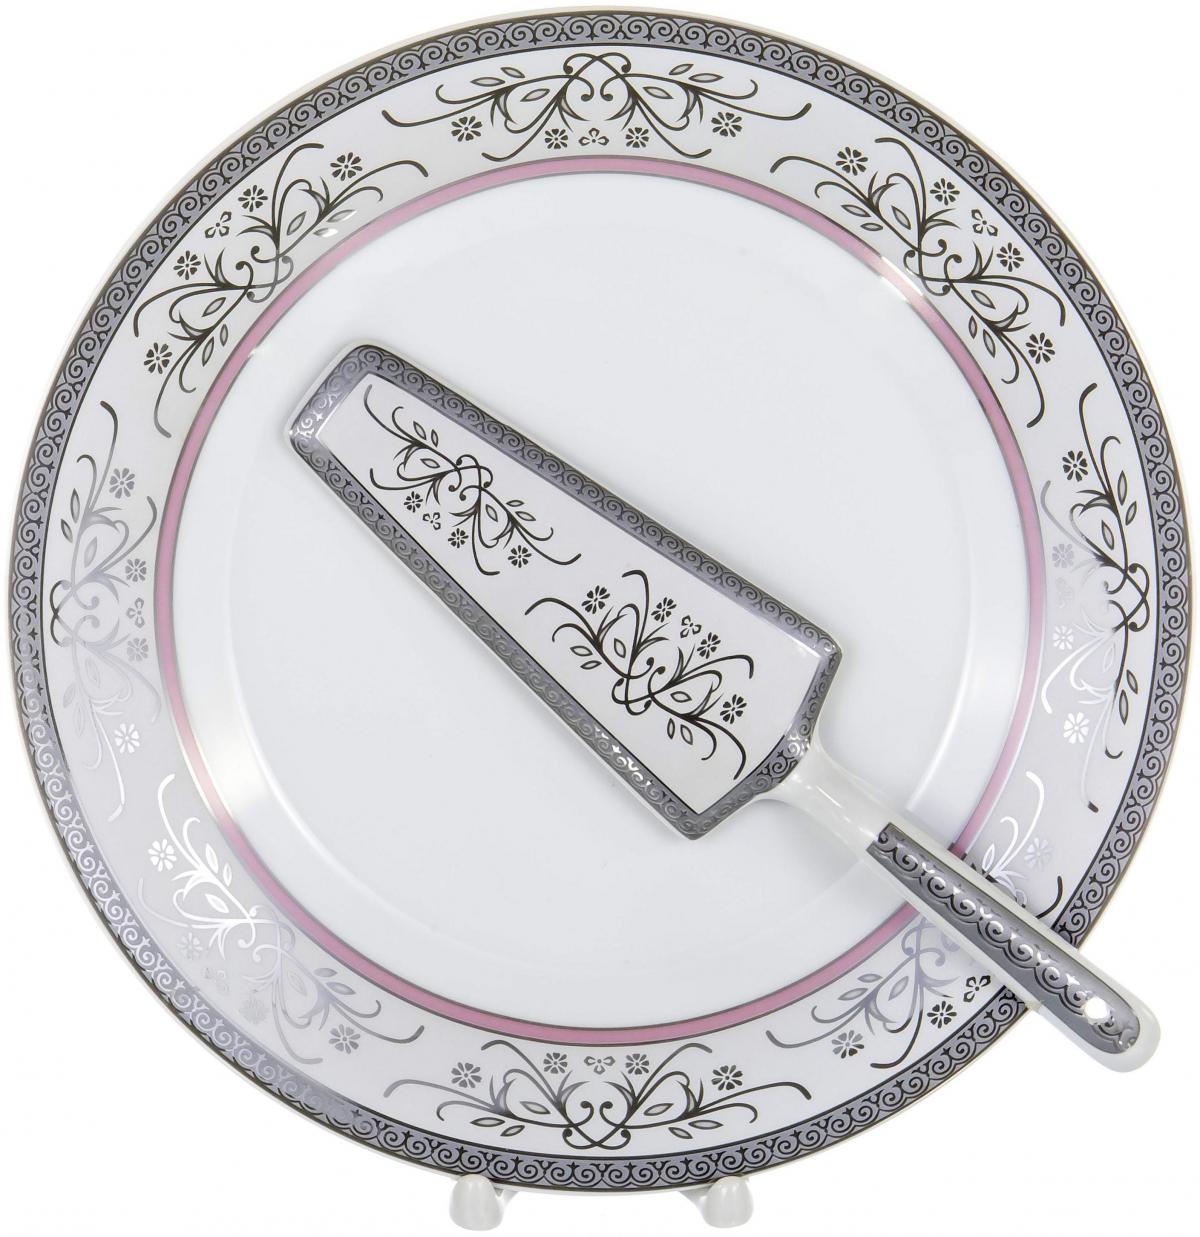 Набор для торта Olaff, 2 предмета. LRS-CPN2-010 набор пилок bosch 2 607 010 515 дер пласт мет 3шт 2 607 010 515